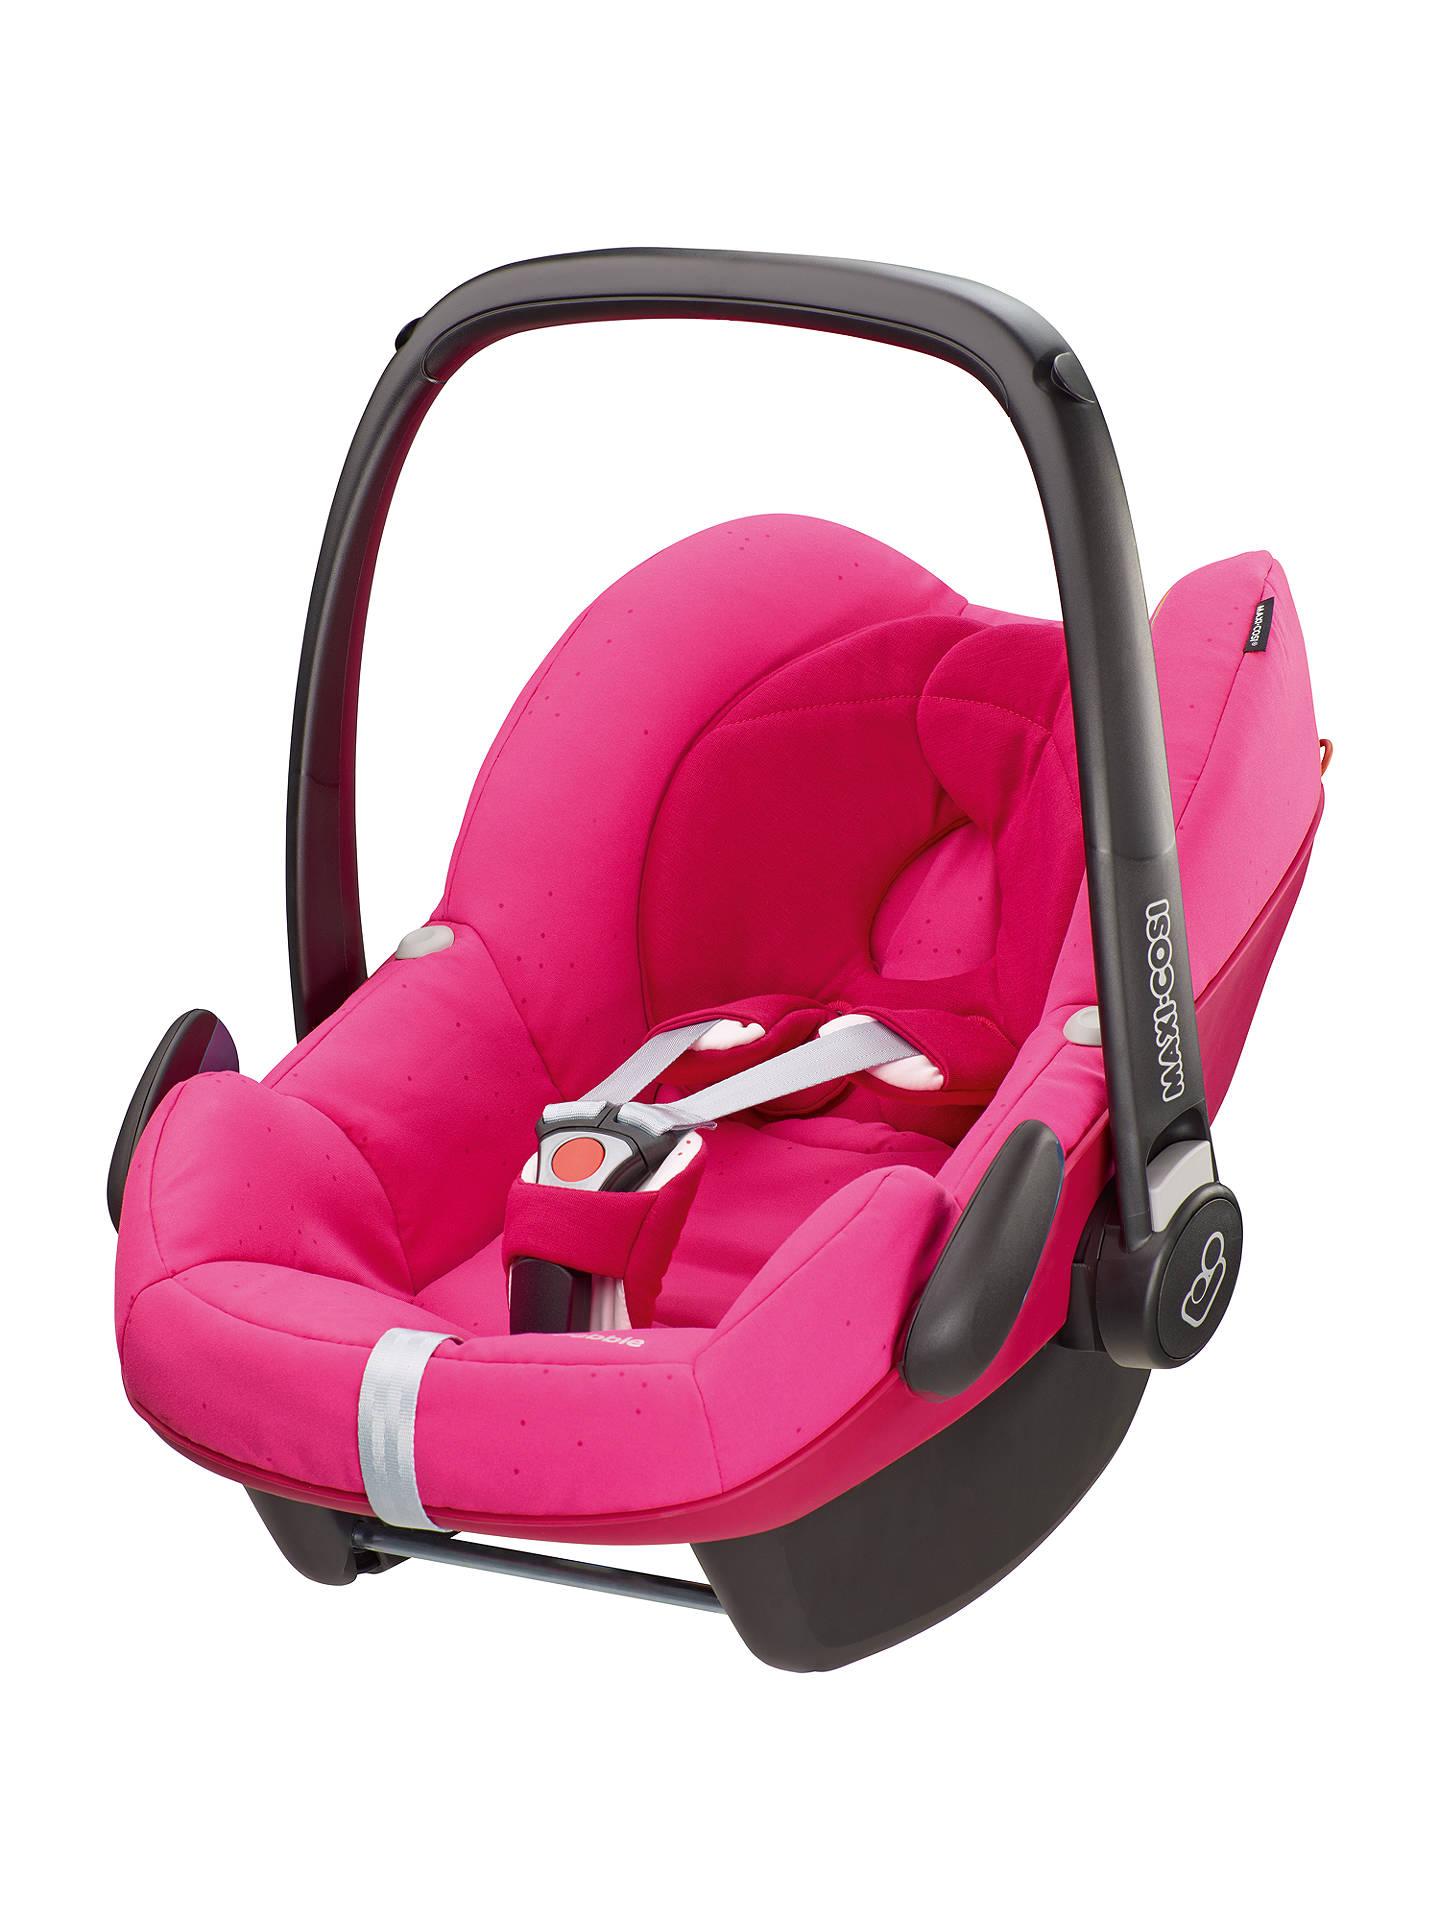 Maxi-Cosi Pebble Group 0+ Baby Car Seat,